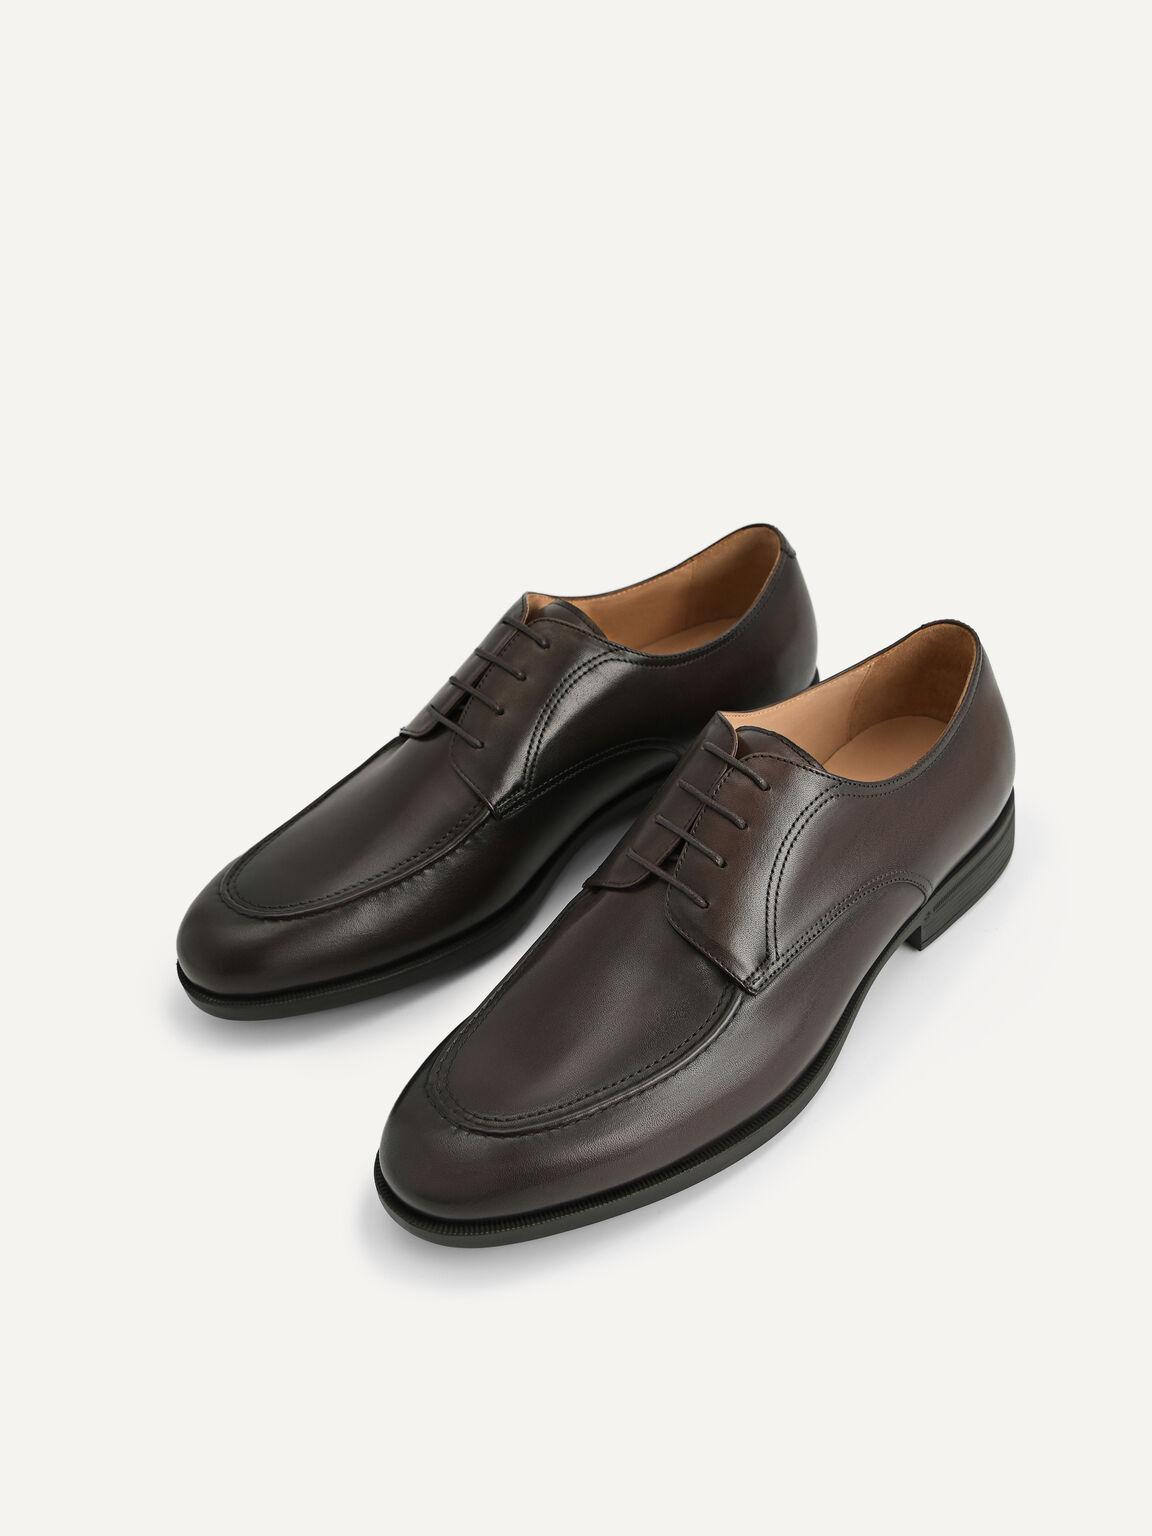 Altitude Leather Derby Shoes, Dark Brown, hi-res